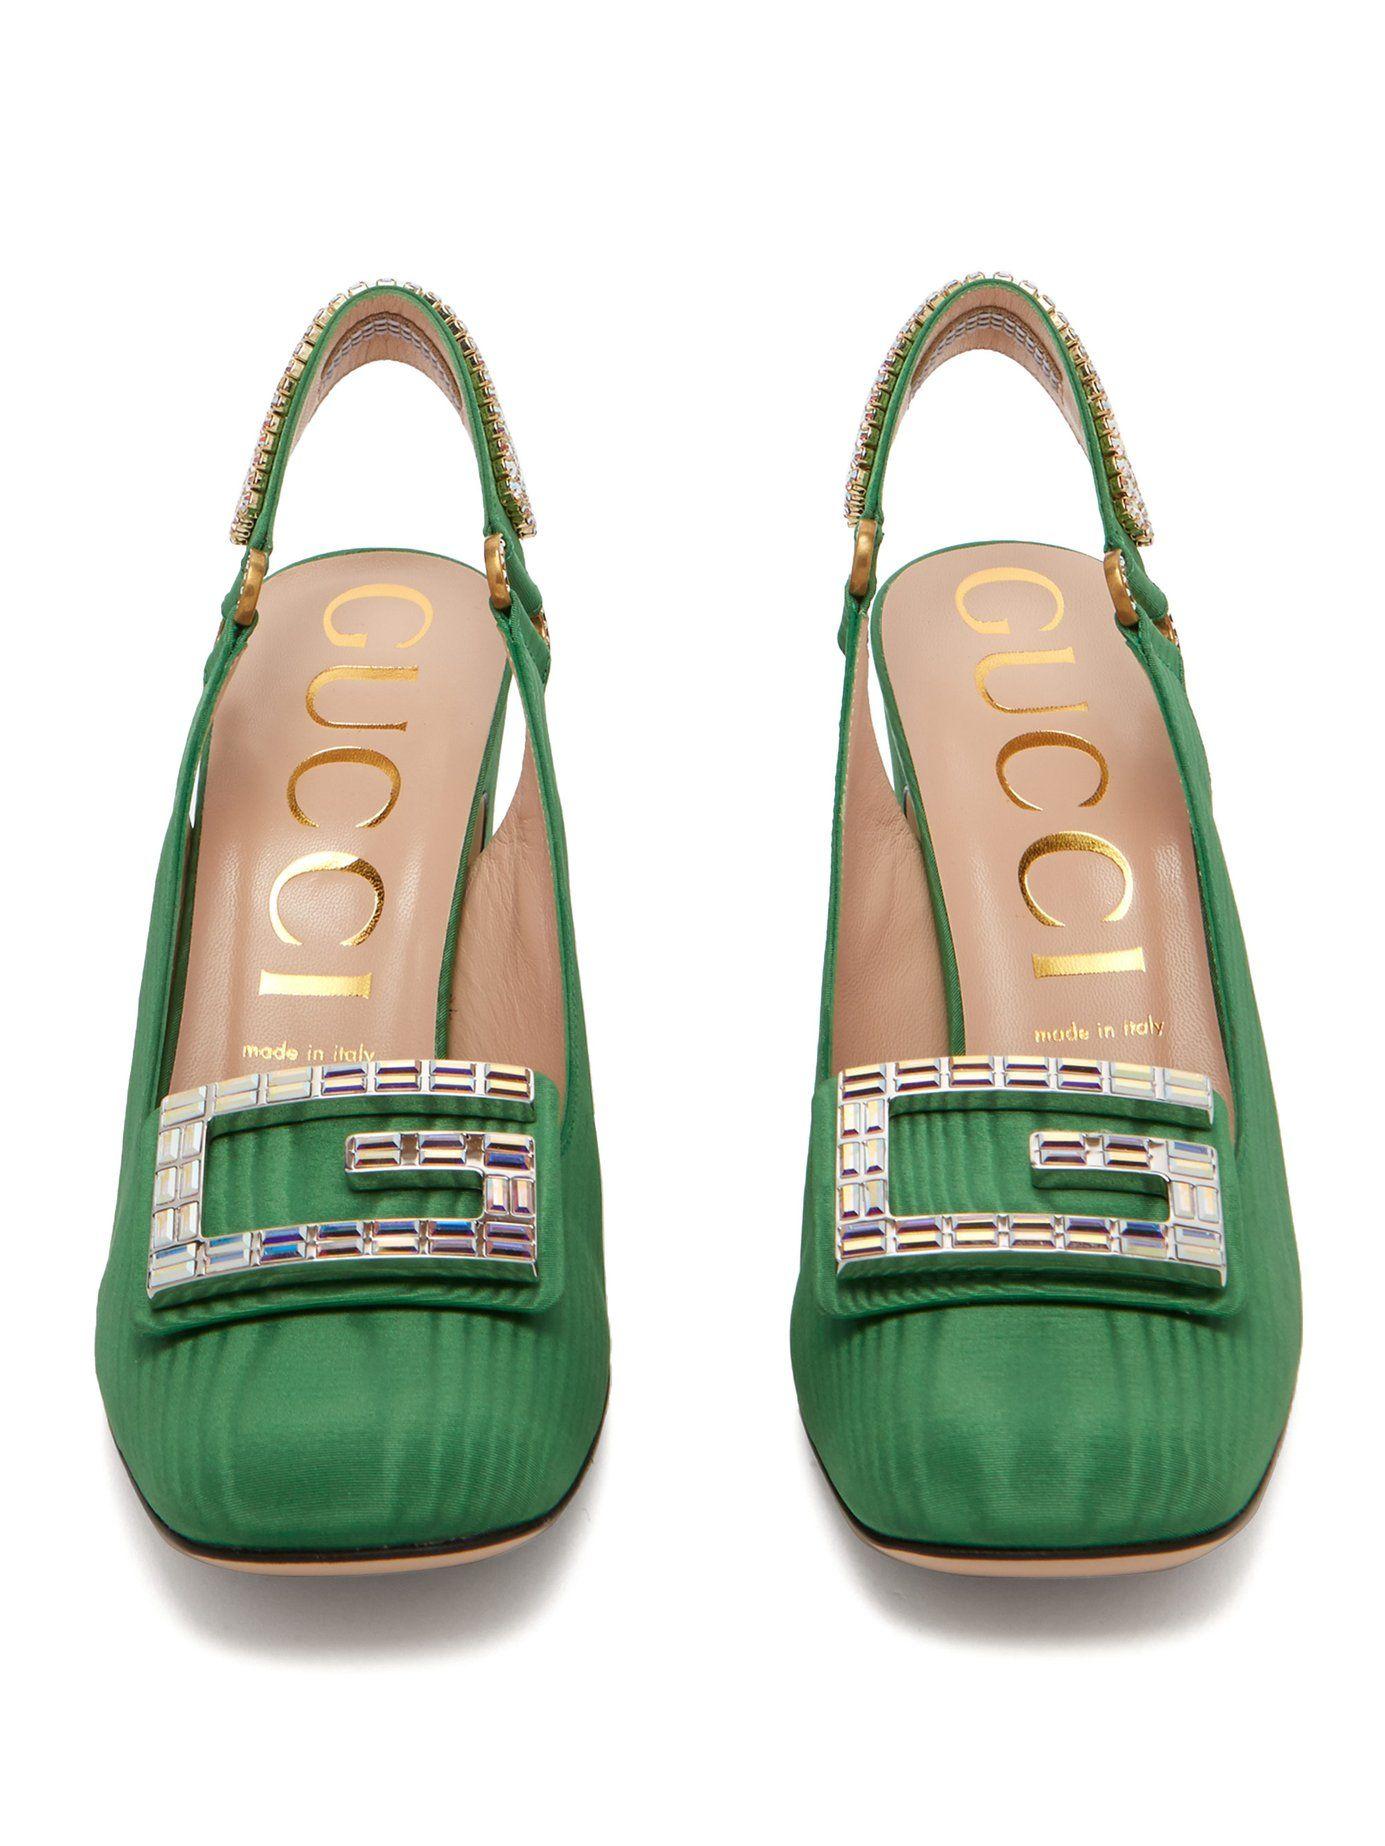 84107a3fca Madelyn crystal-embellished moiré slingback pumps | Gucci |  MATCHESFASHION.COM US